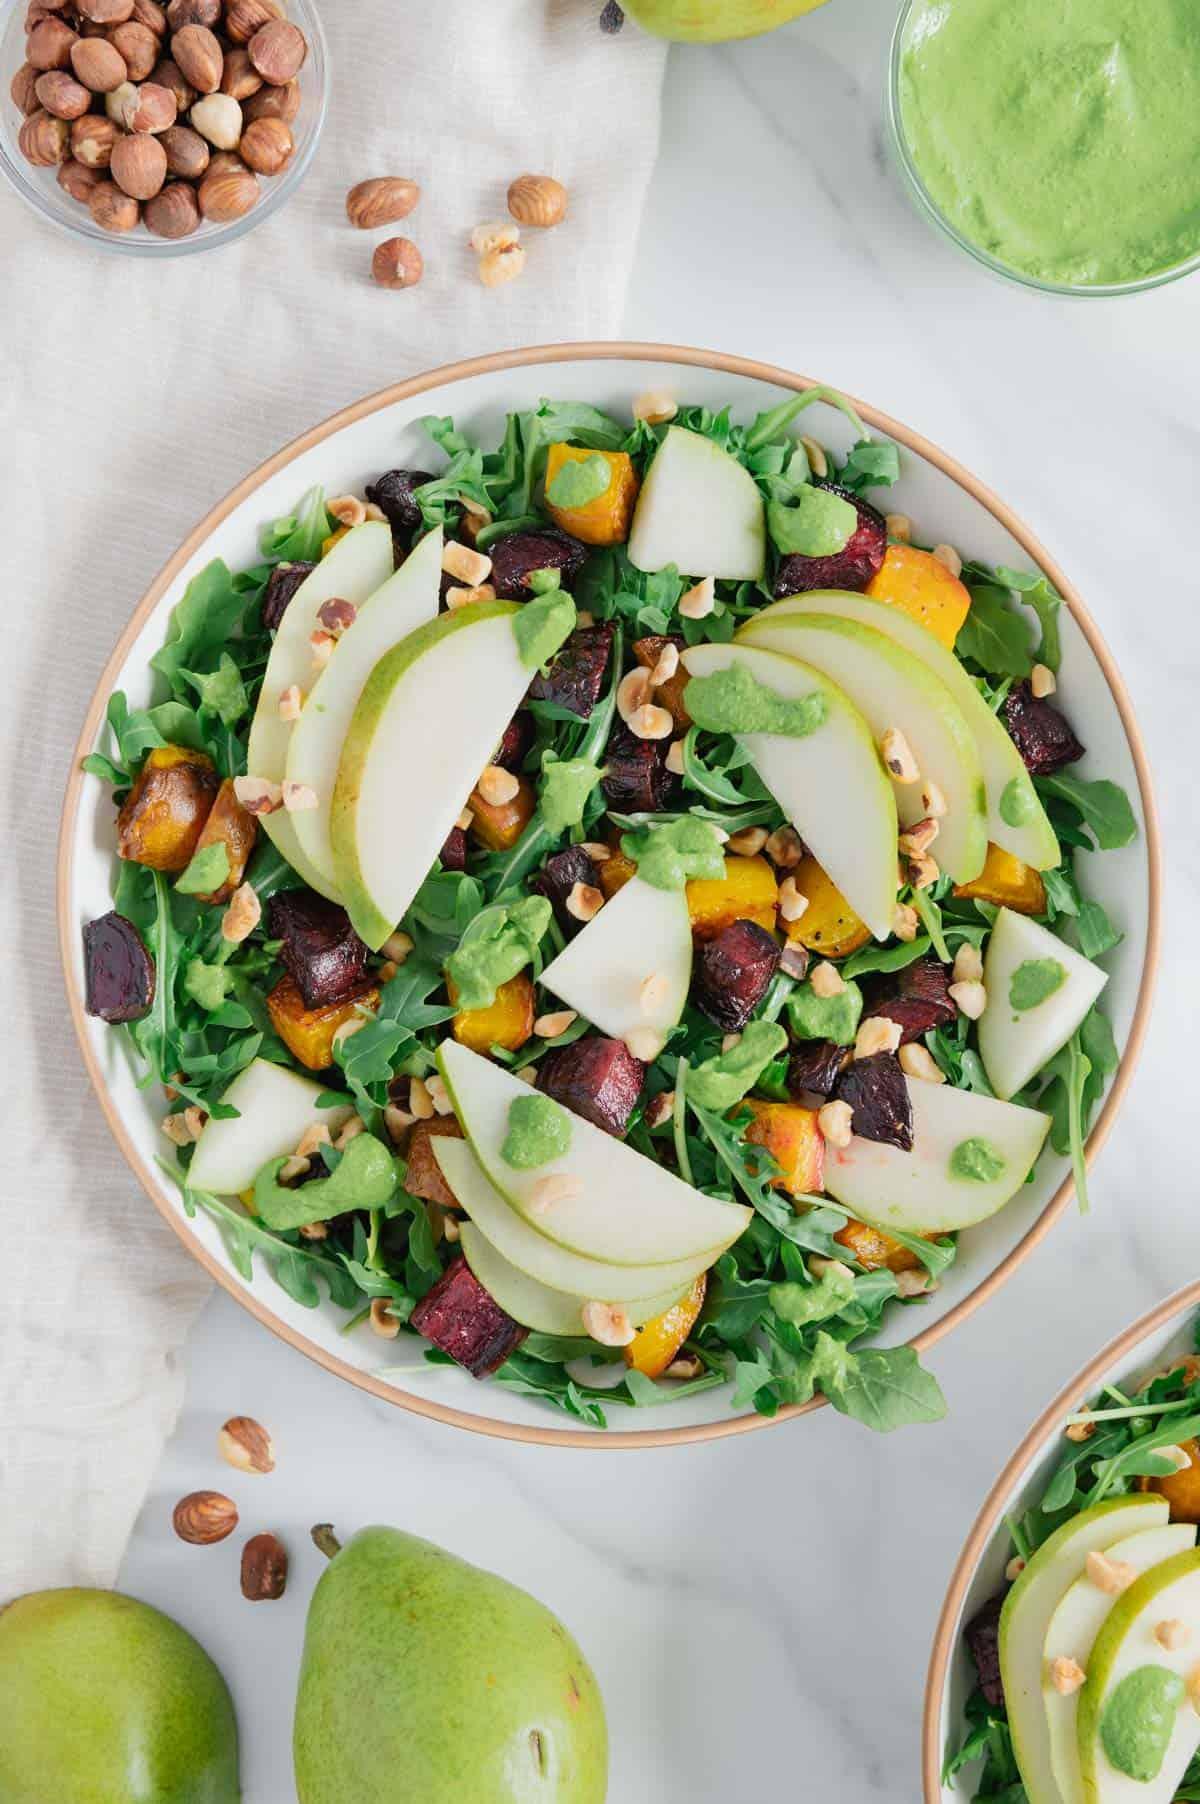 Pear and Roasted Beet Arugula Salad with Hazelnuts